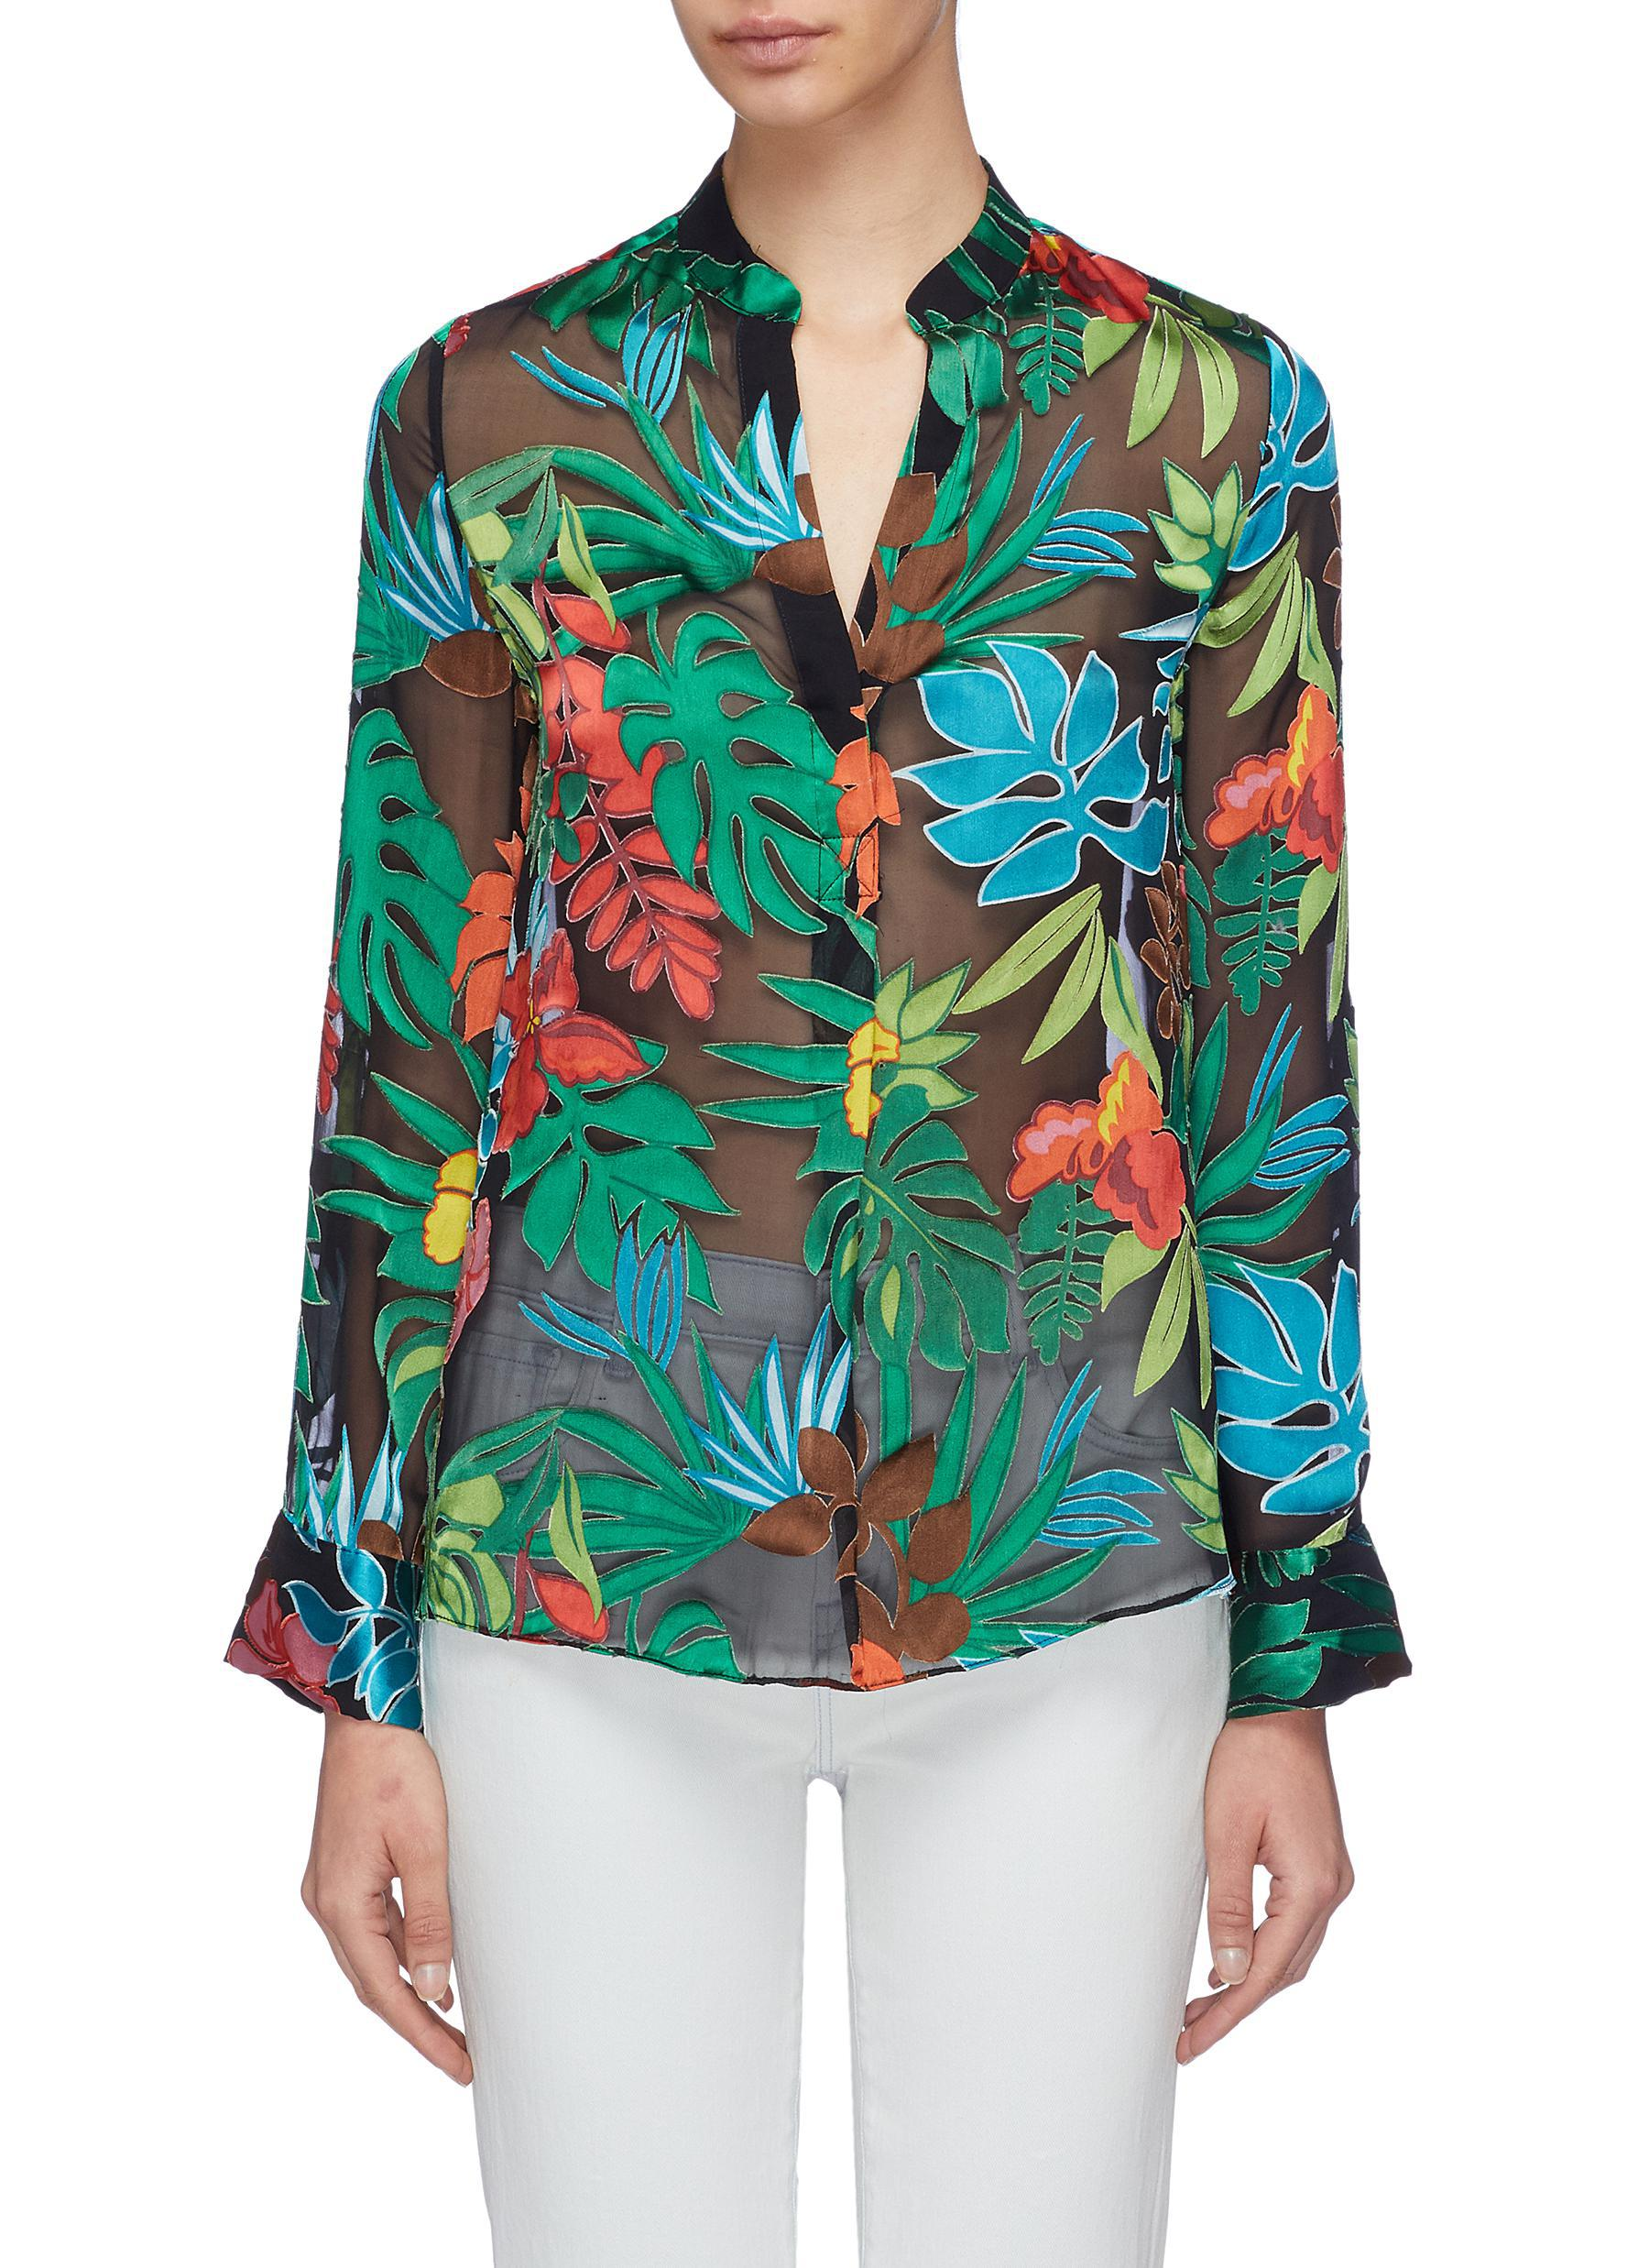 632834e7d5c Alice + Olivia 'amos' Floral Palm Leaf Burnout Tunic Top for Men - Lyst